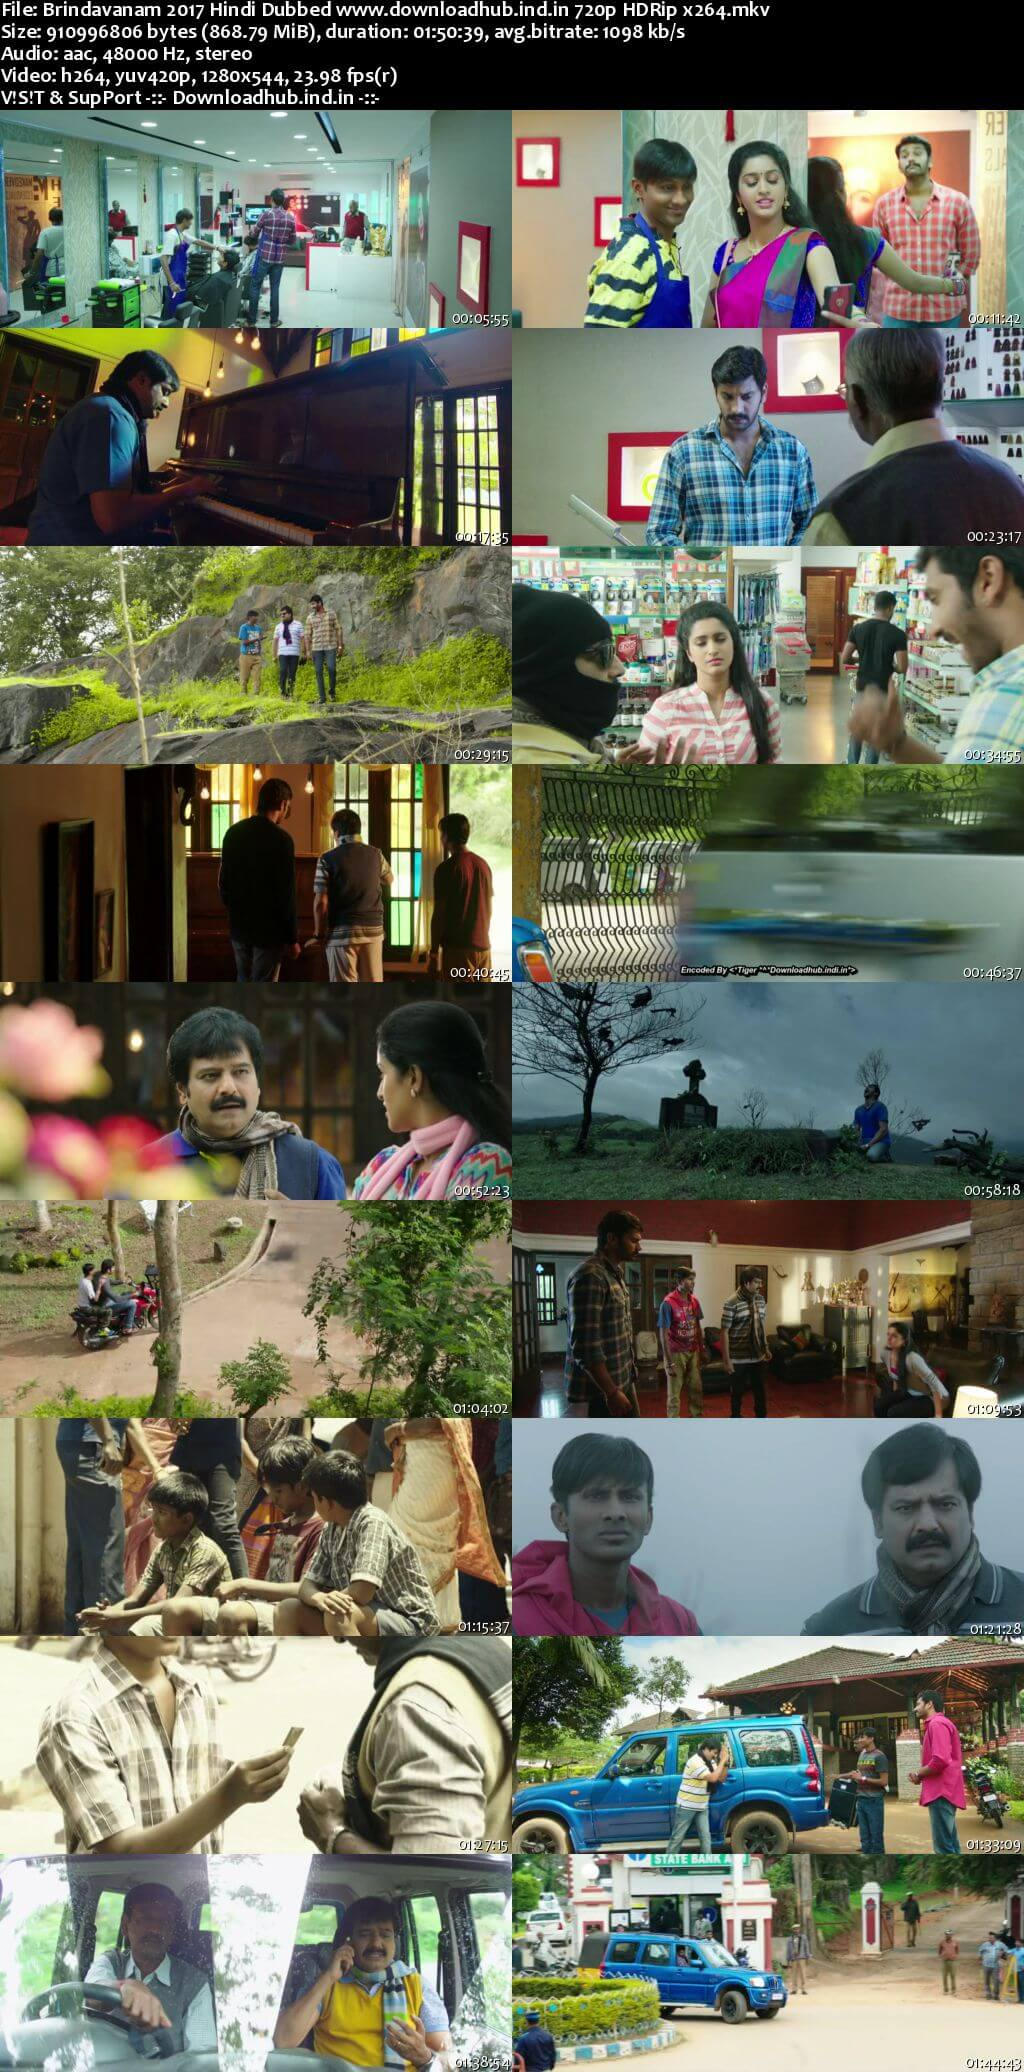 Brindavanam 2017 Hindi Dubbed 720p HDRip x264